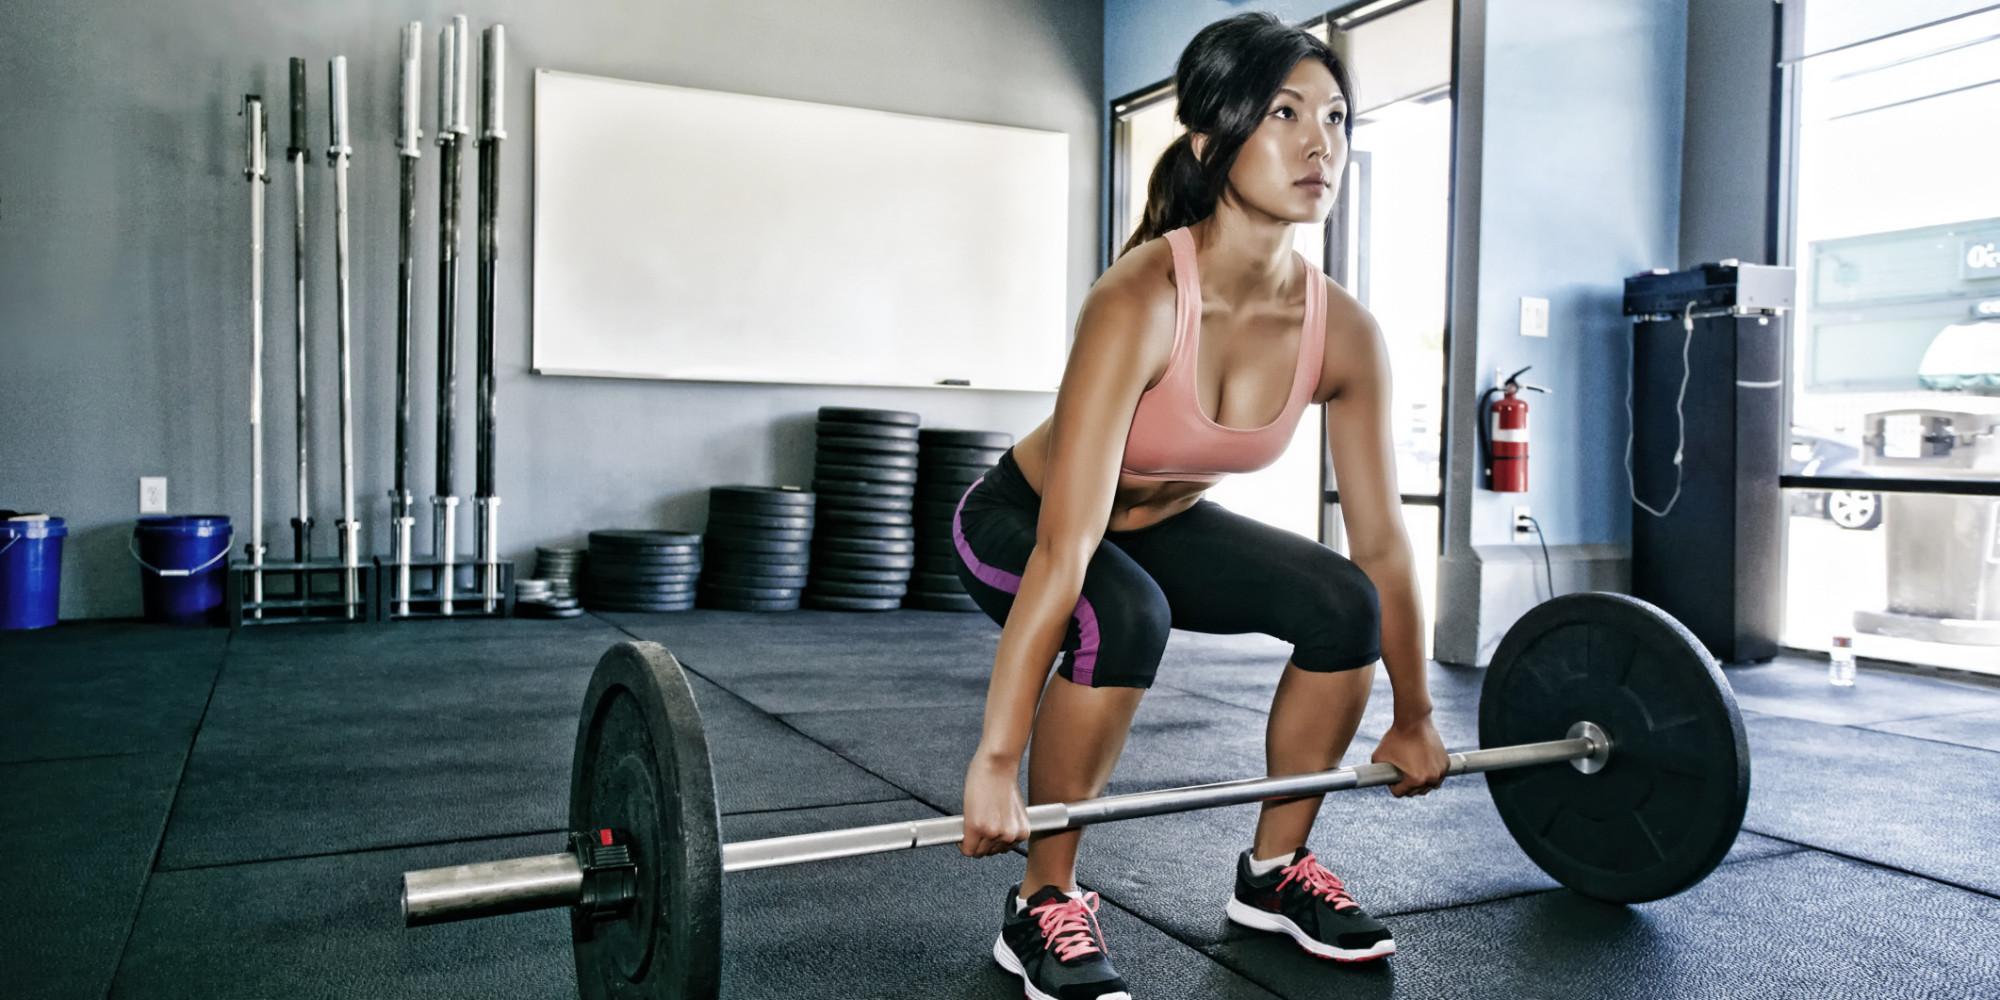 nude female strength training